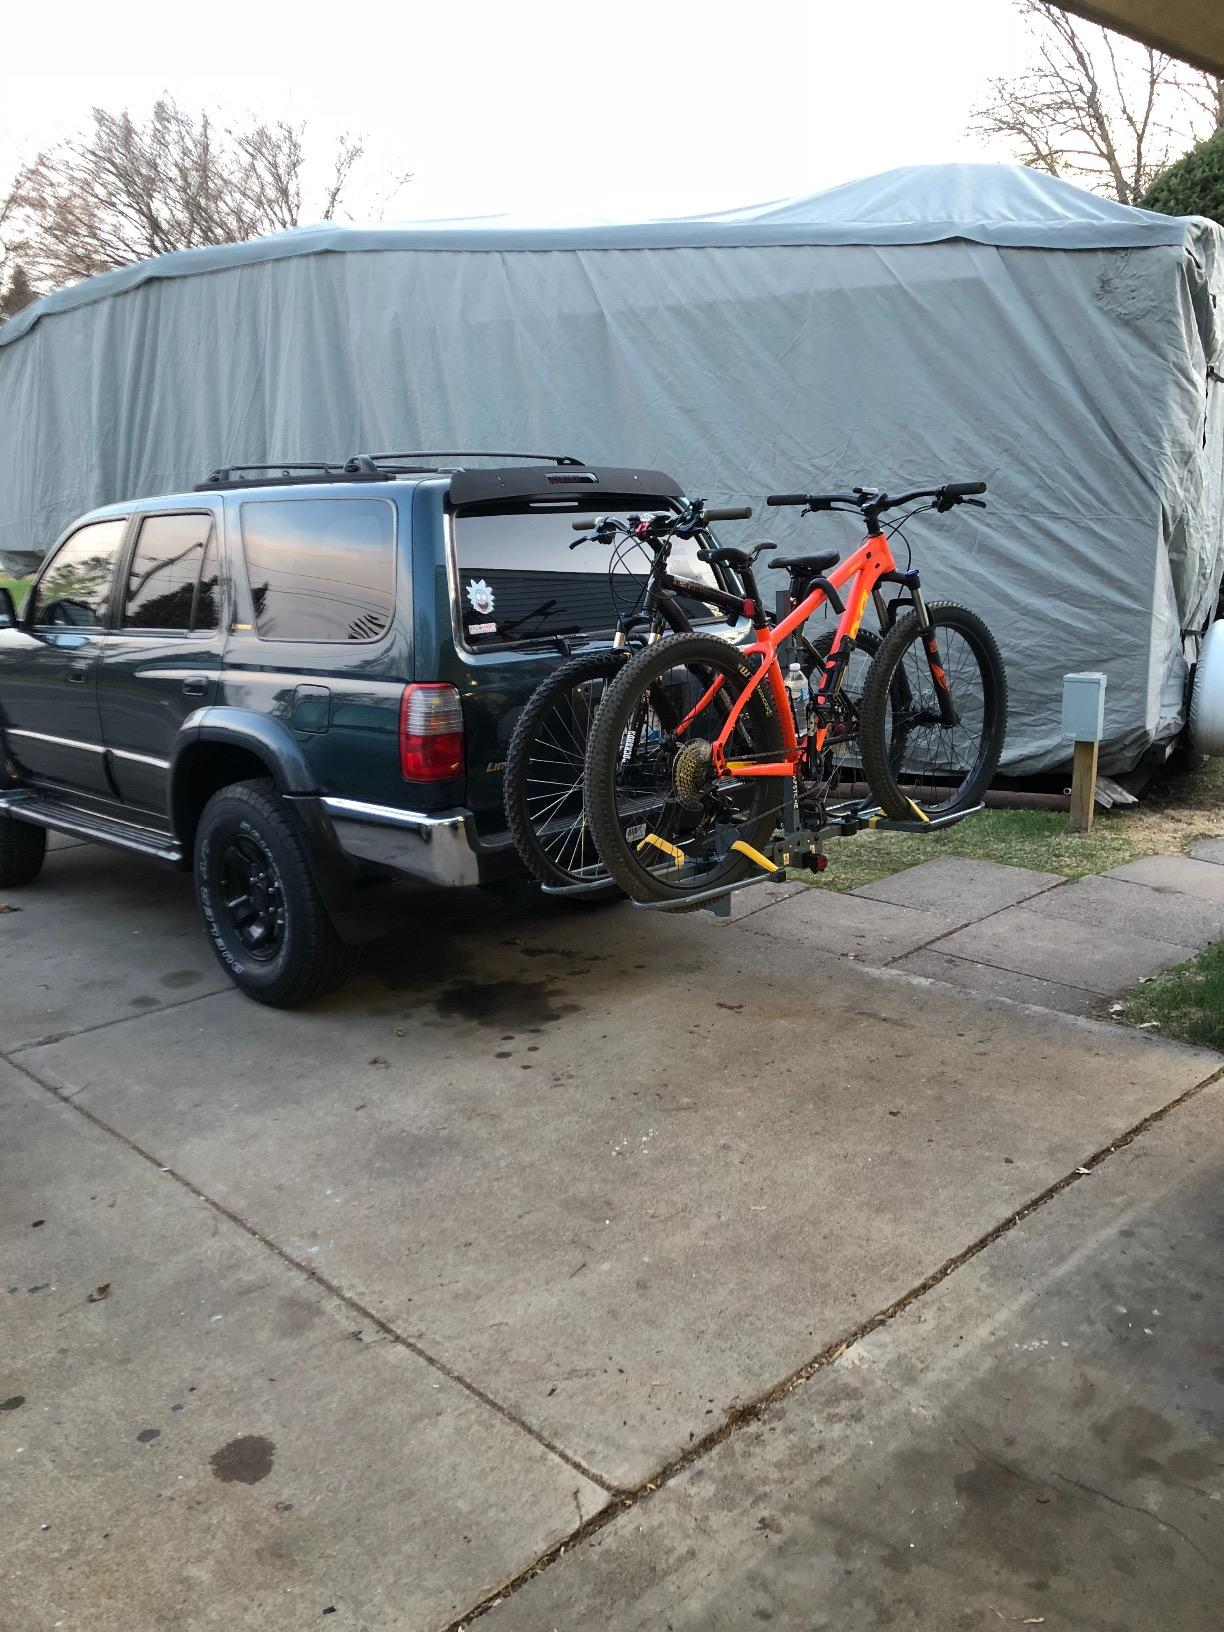 Capstone 10012 Hitch Mount 2 Bike Carrier